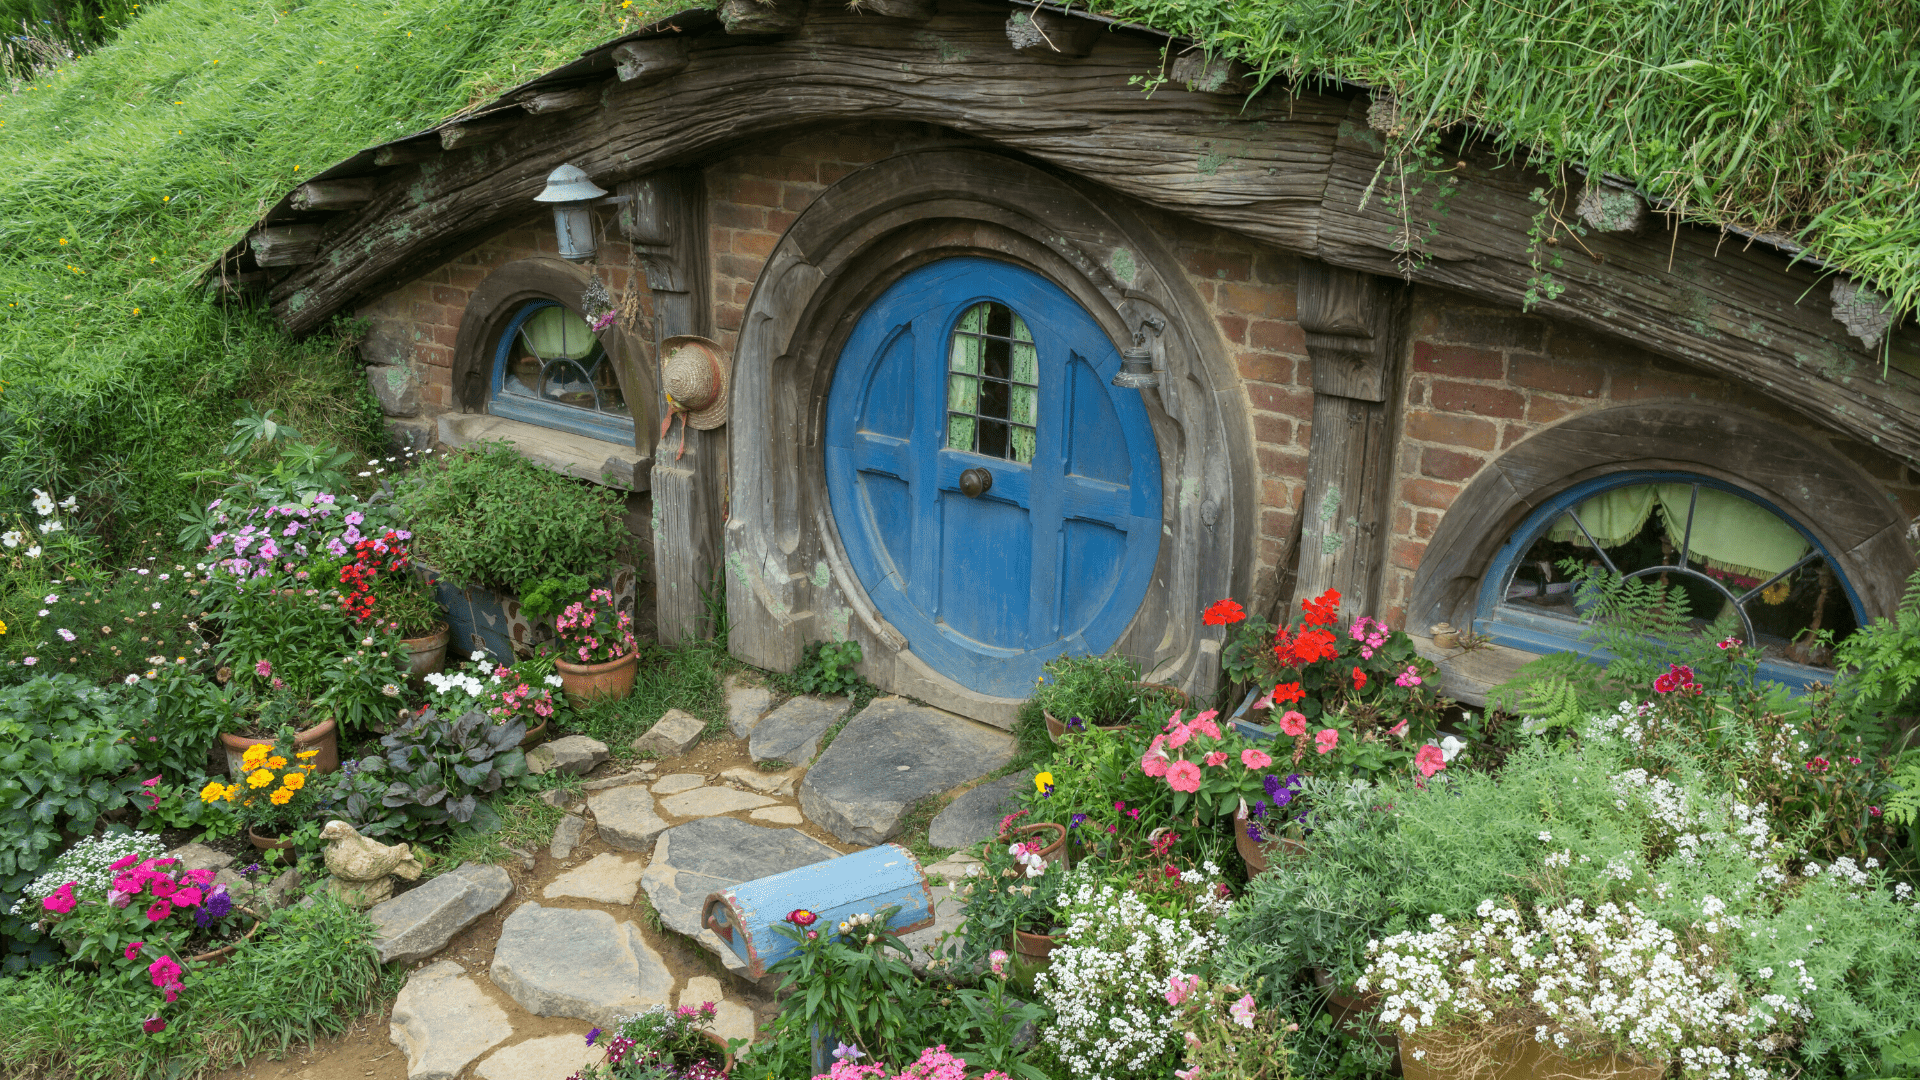 Lord of the rings Hobbit homes New Zealand blue door